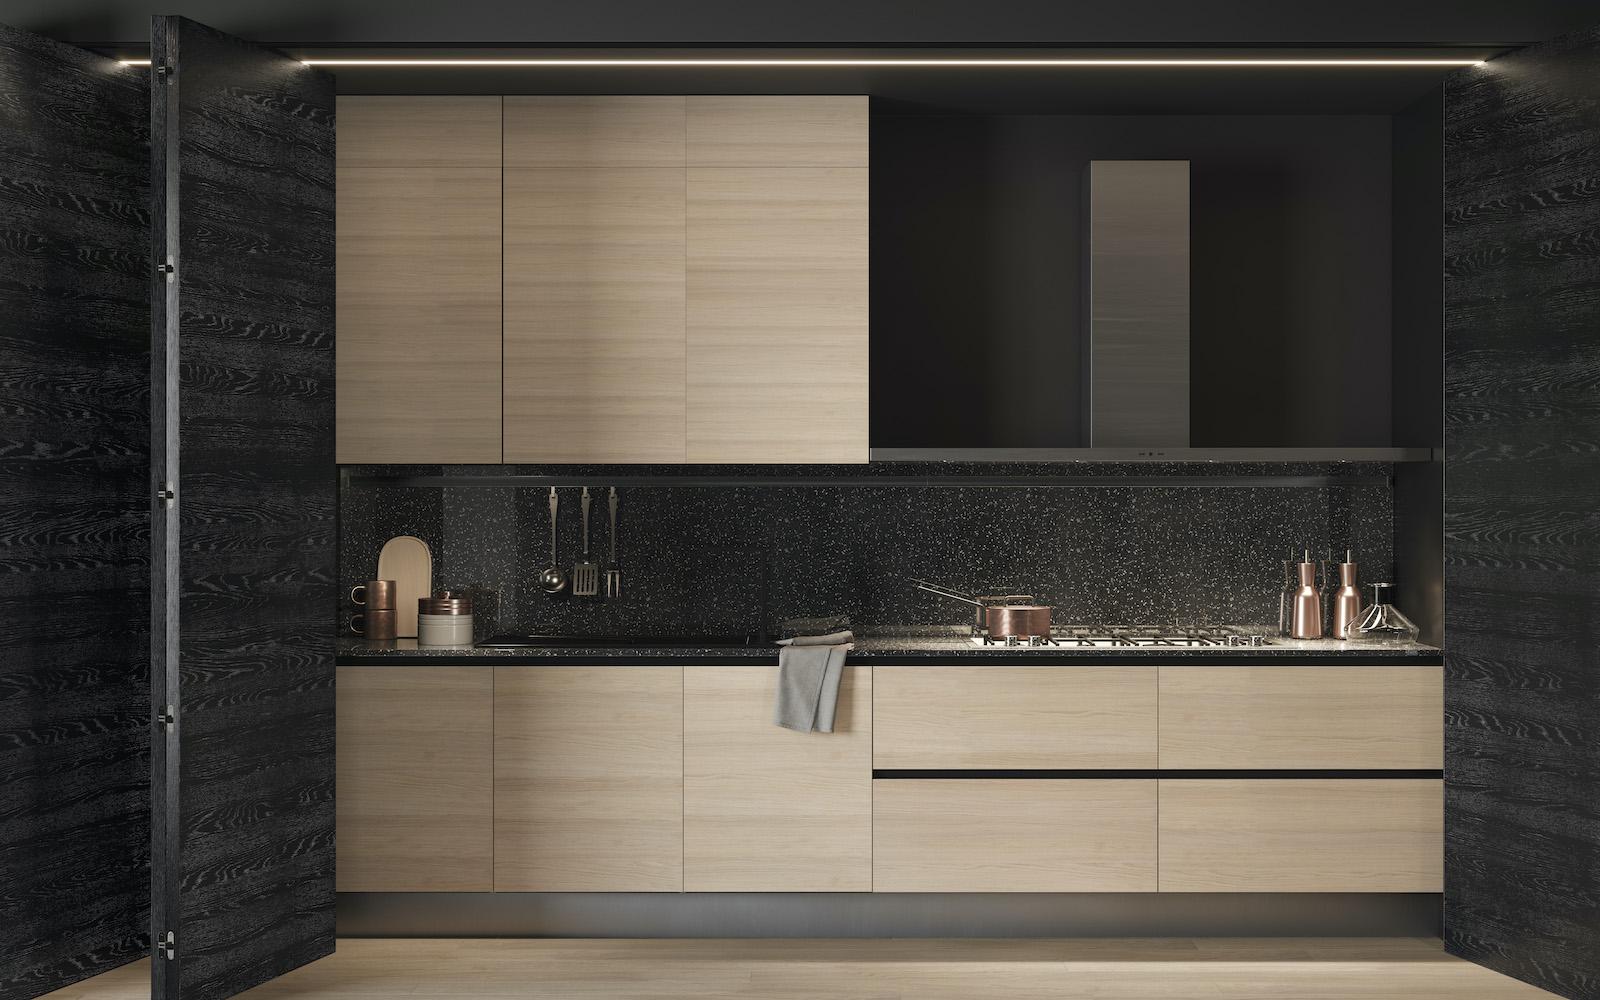 parete divisoria con apertura a fisarmonica e parquet Garofoli per cucina moderna